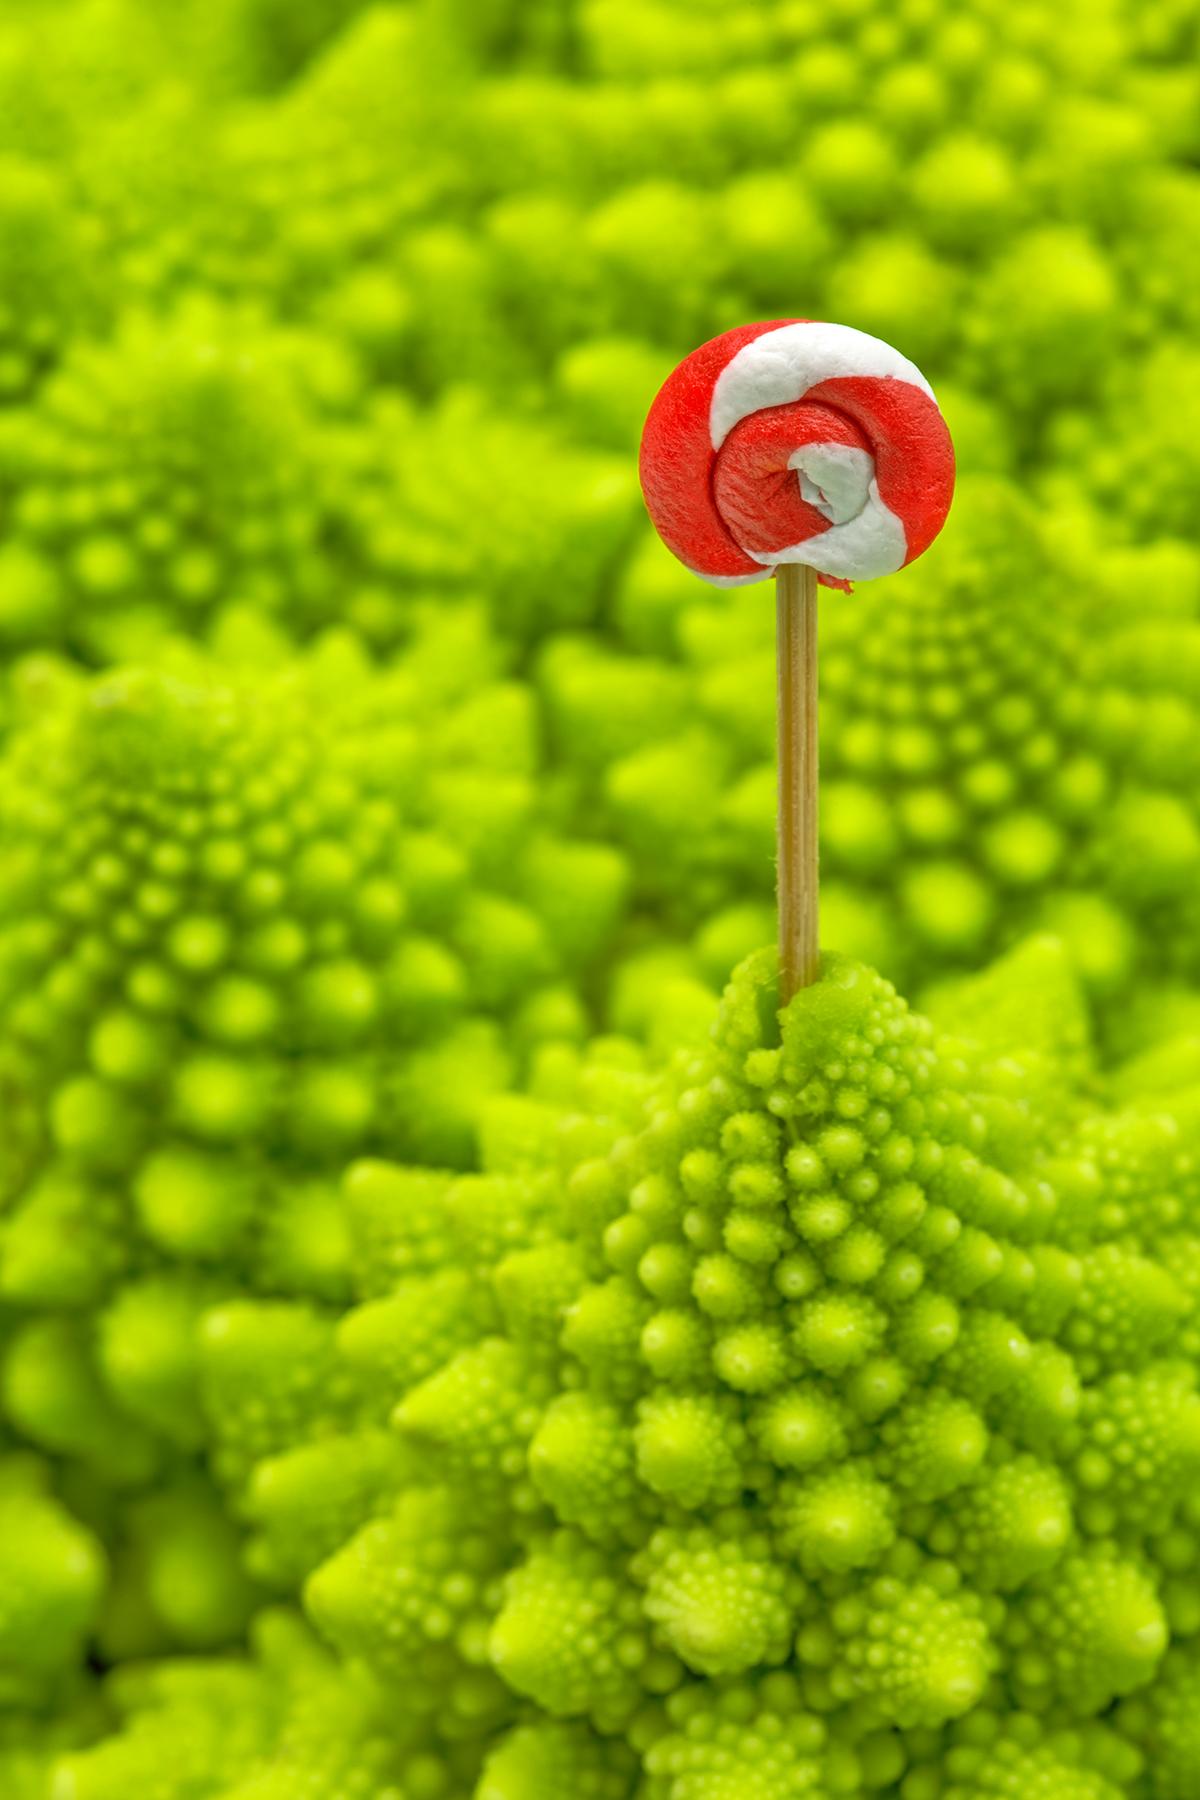 Romanesco lollipop - hdr photo